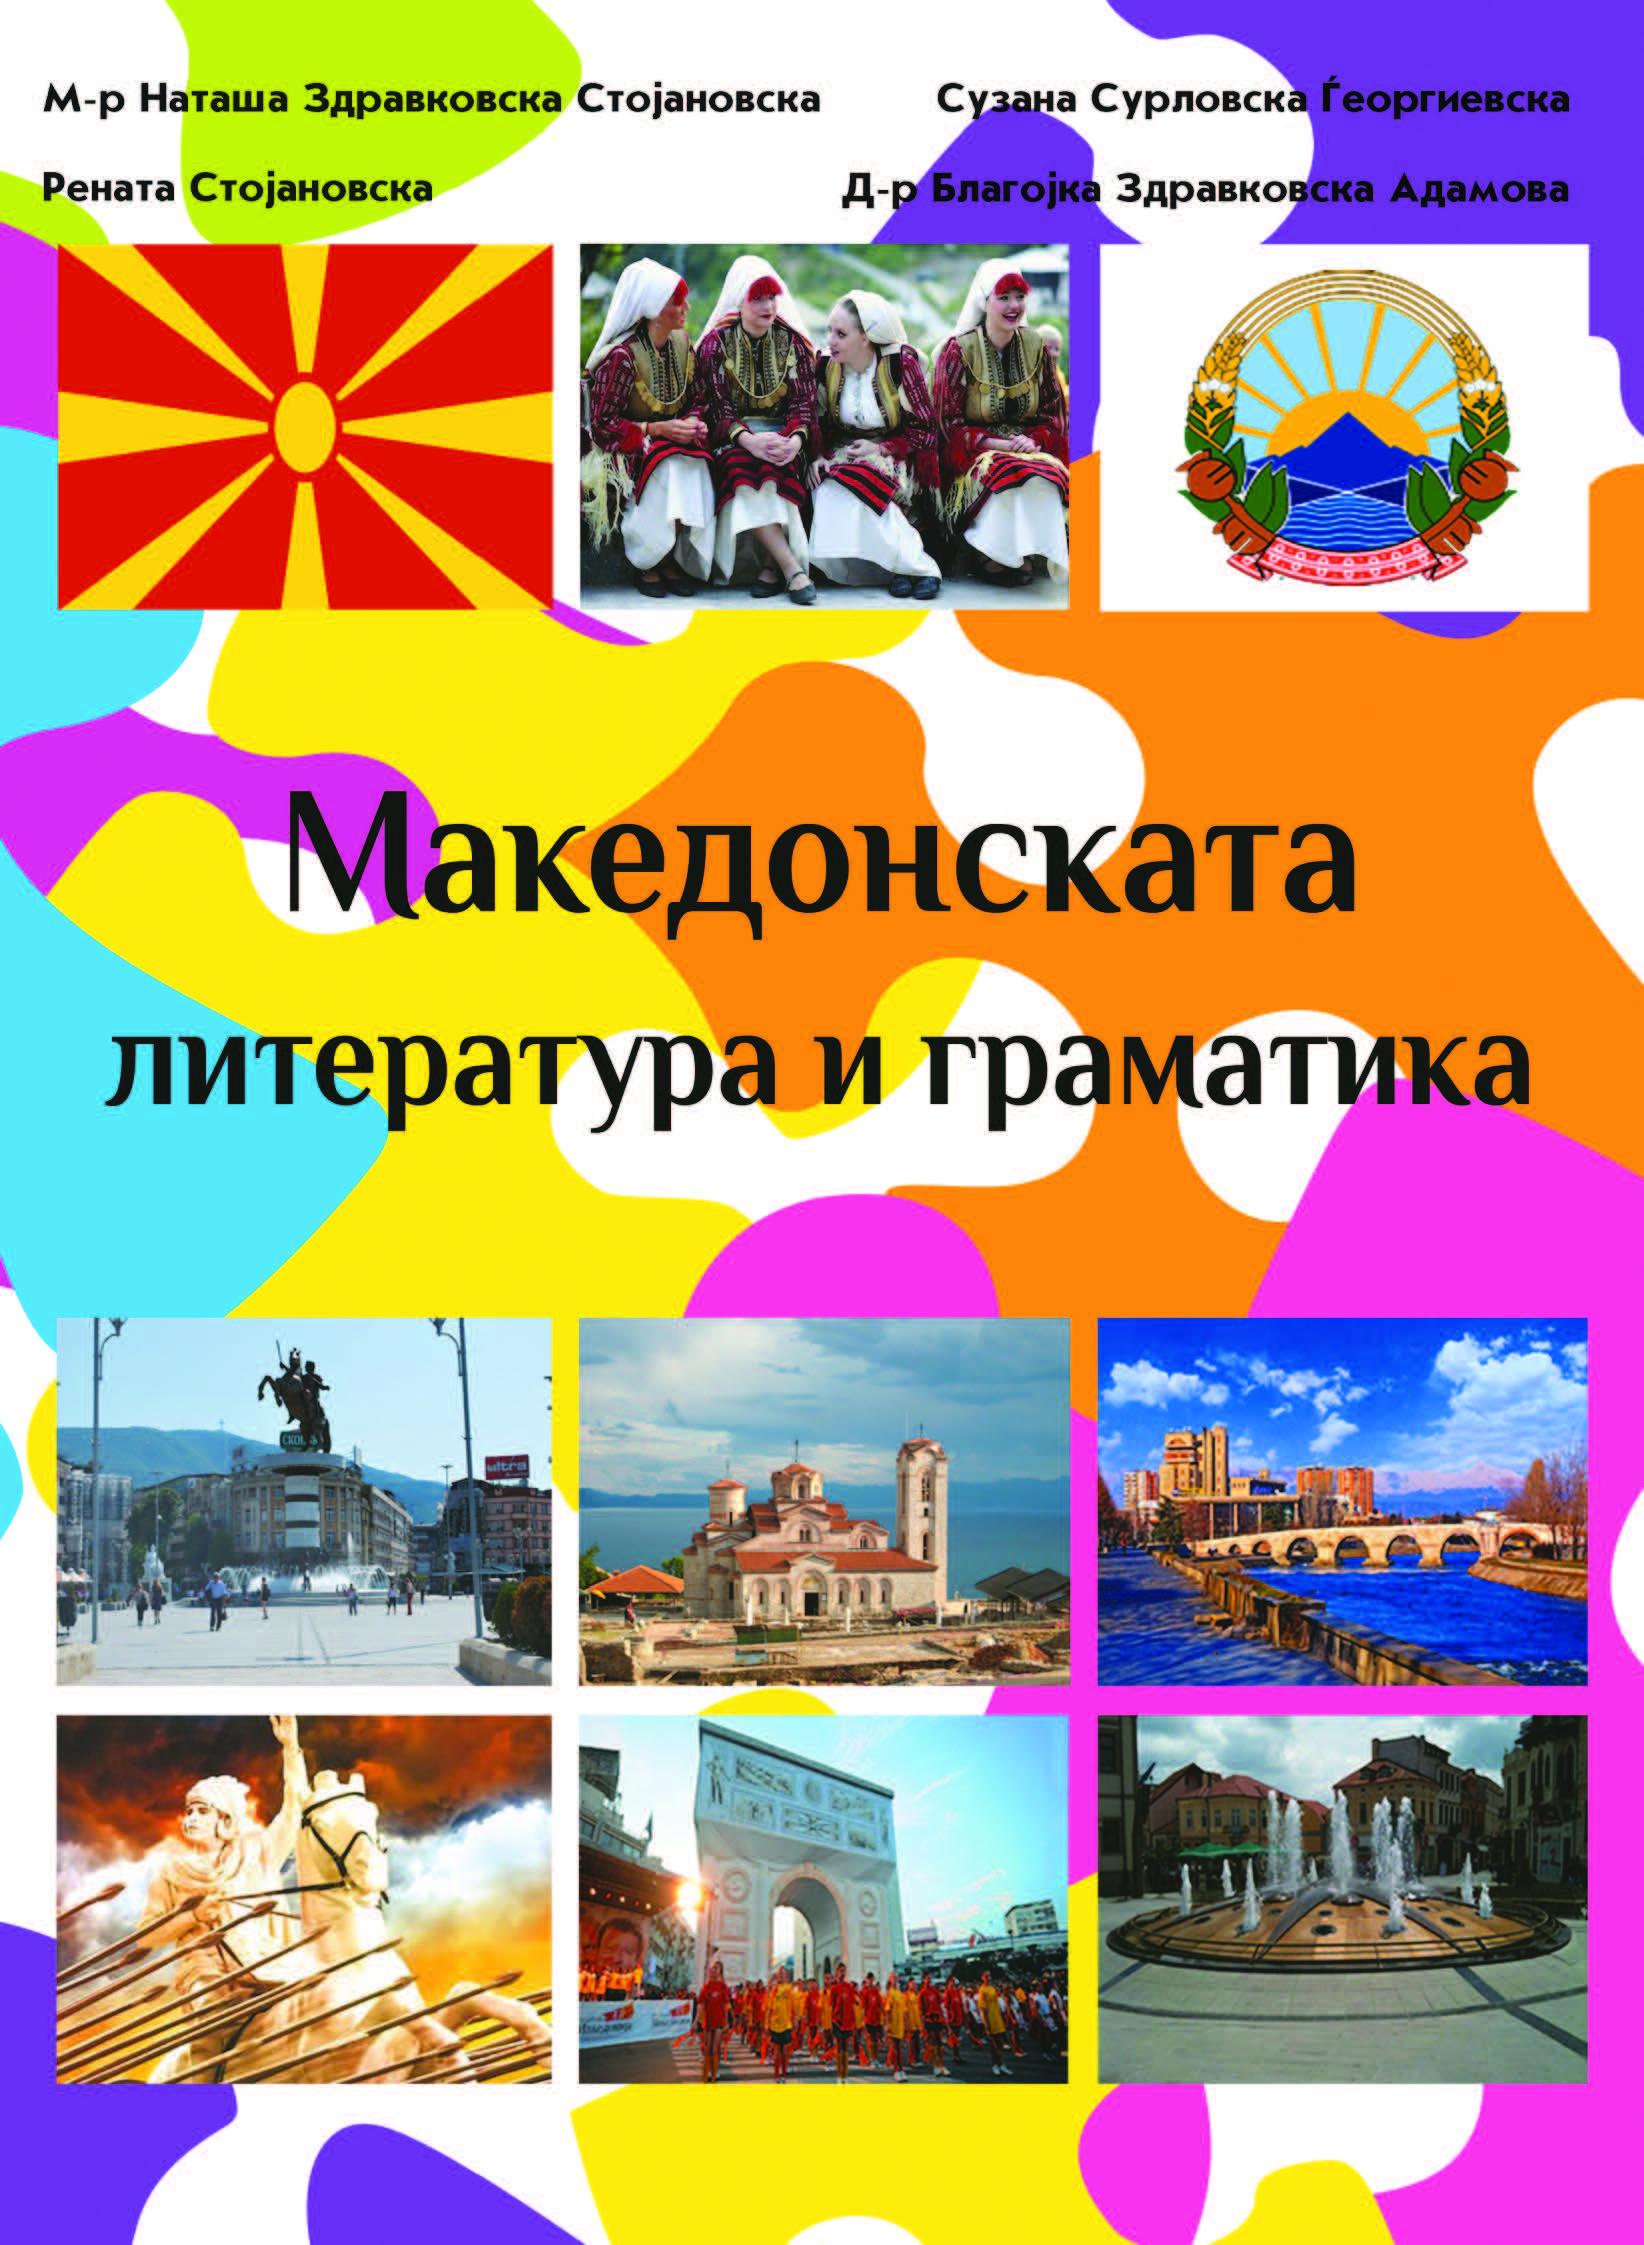 Makedonskata literatura i gramatika – Nataša Zdravkovska Stojanovska i Suzana Surlovska Đeorgievska